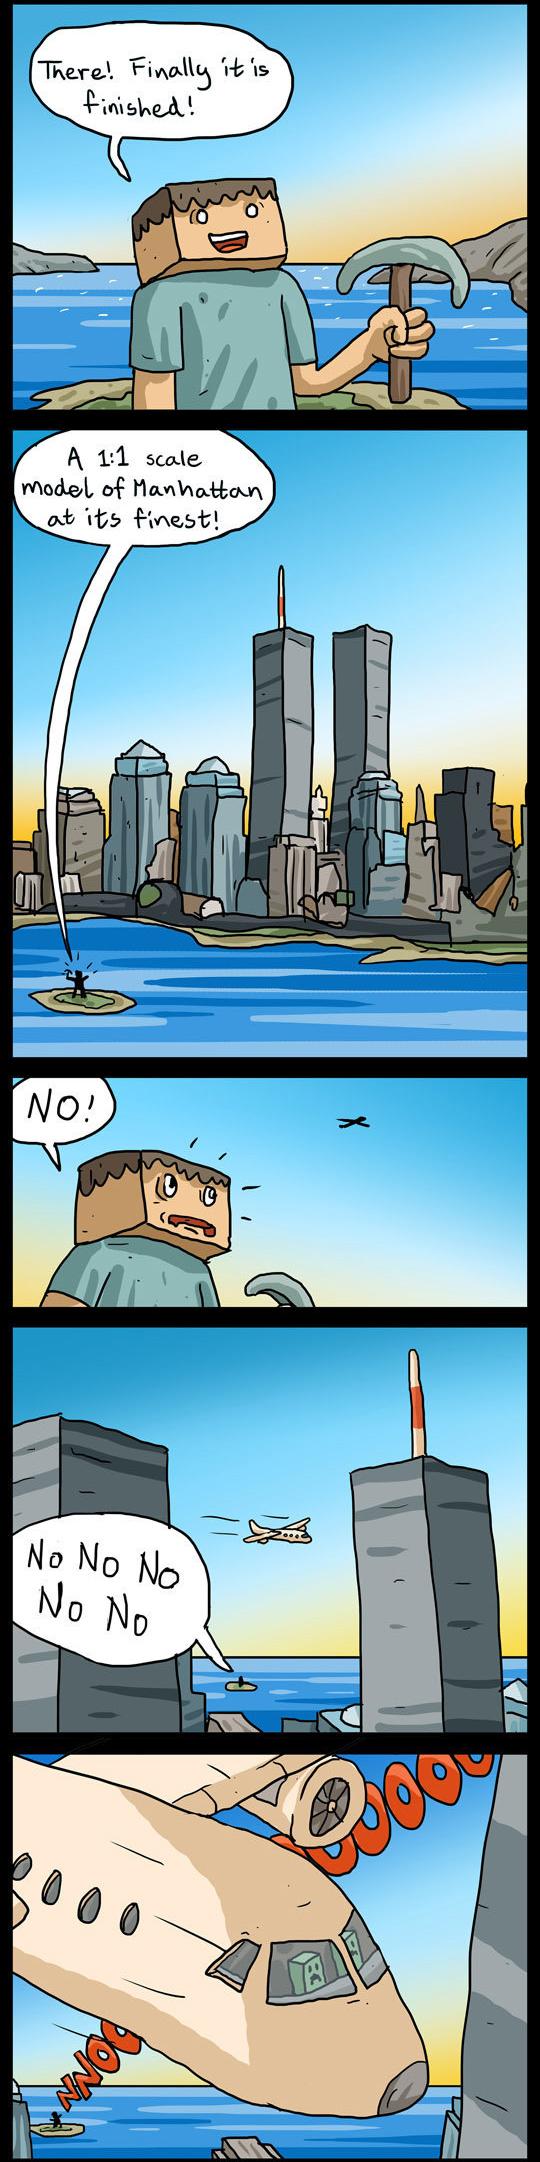 http://img.niceminecraft.net/Funny/Minecraft-Funny-3.jpg